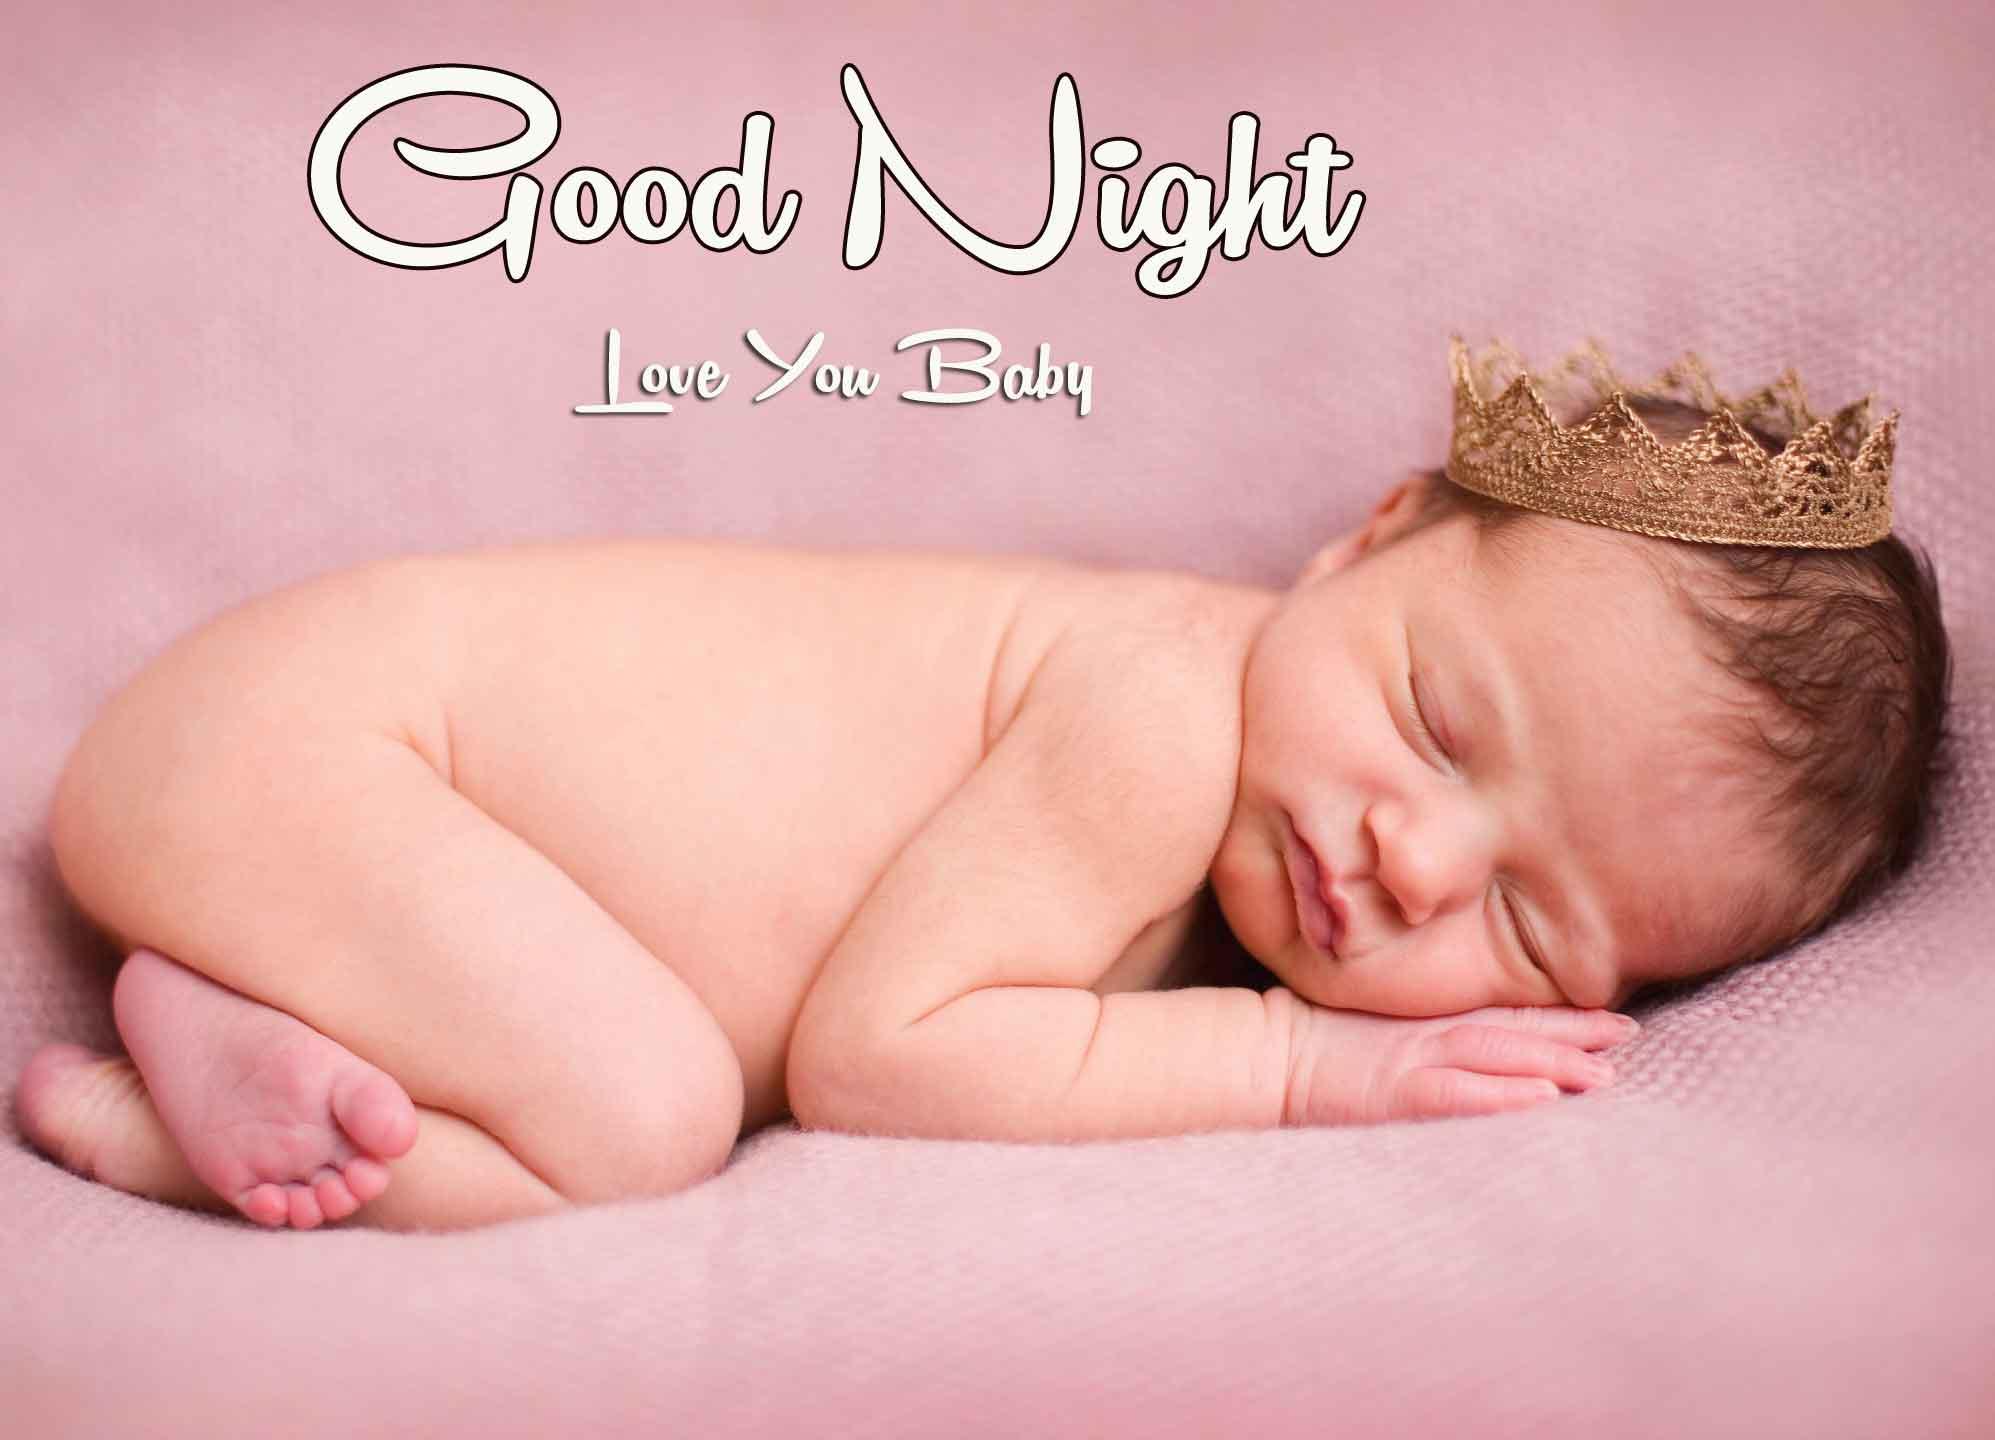 Free good night cute baby Wallpaper Pics Download